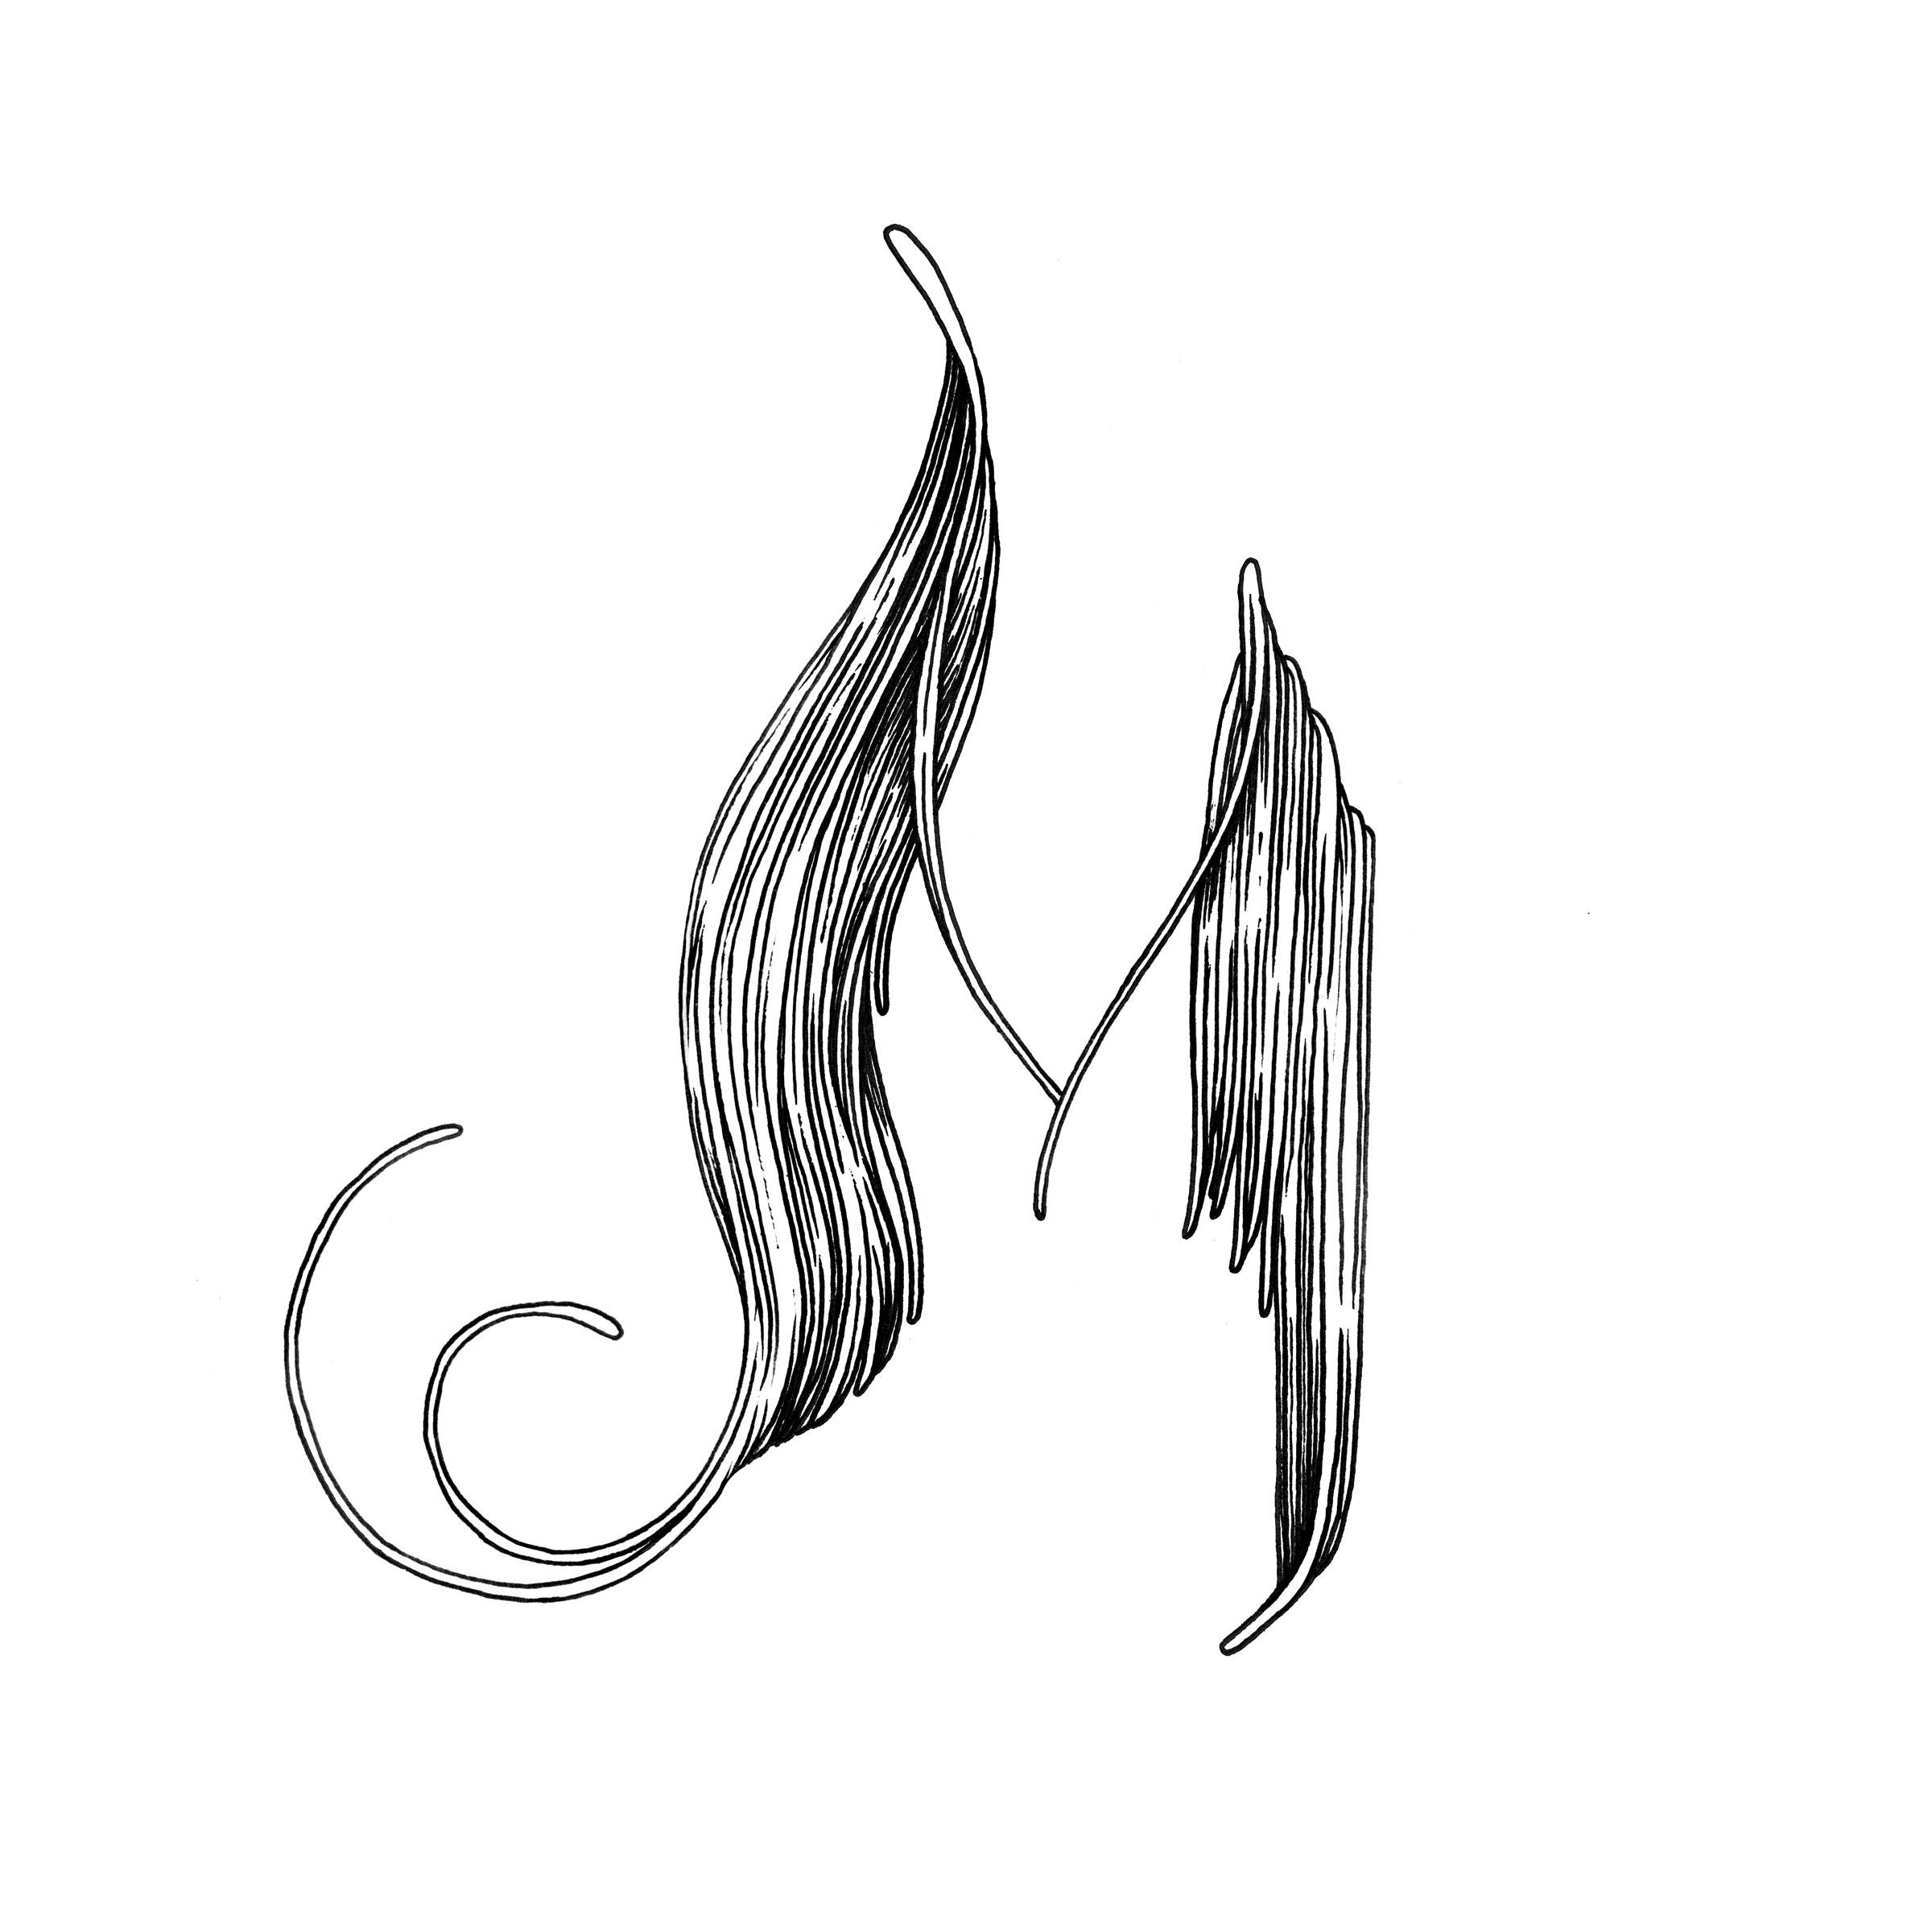 M_02-web.jpg